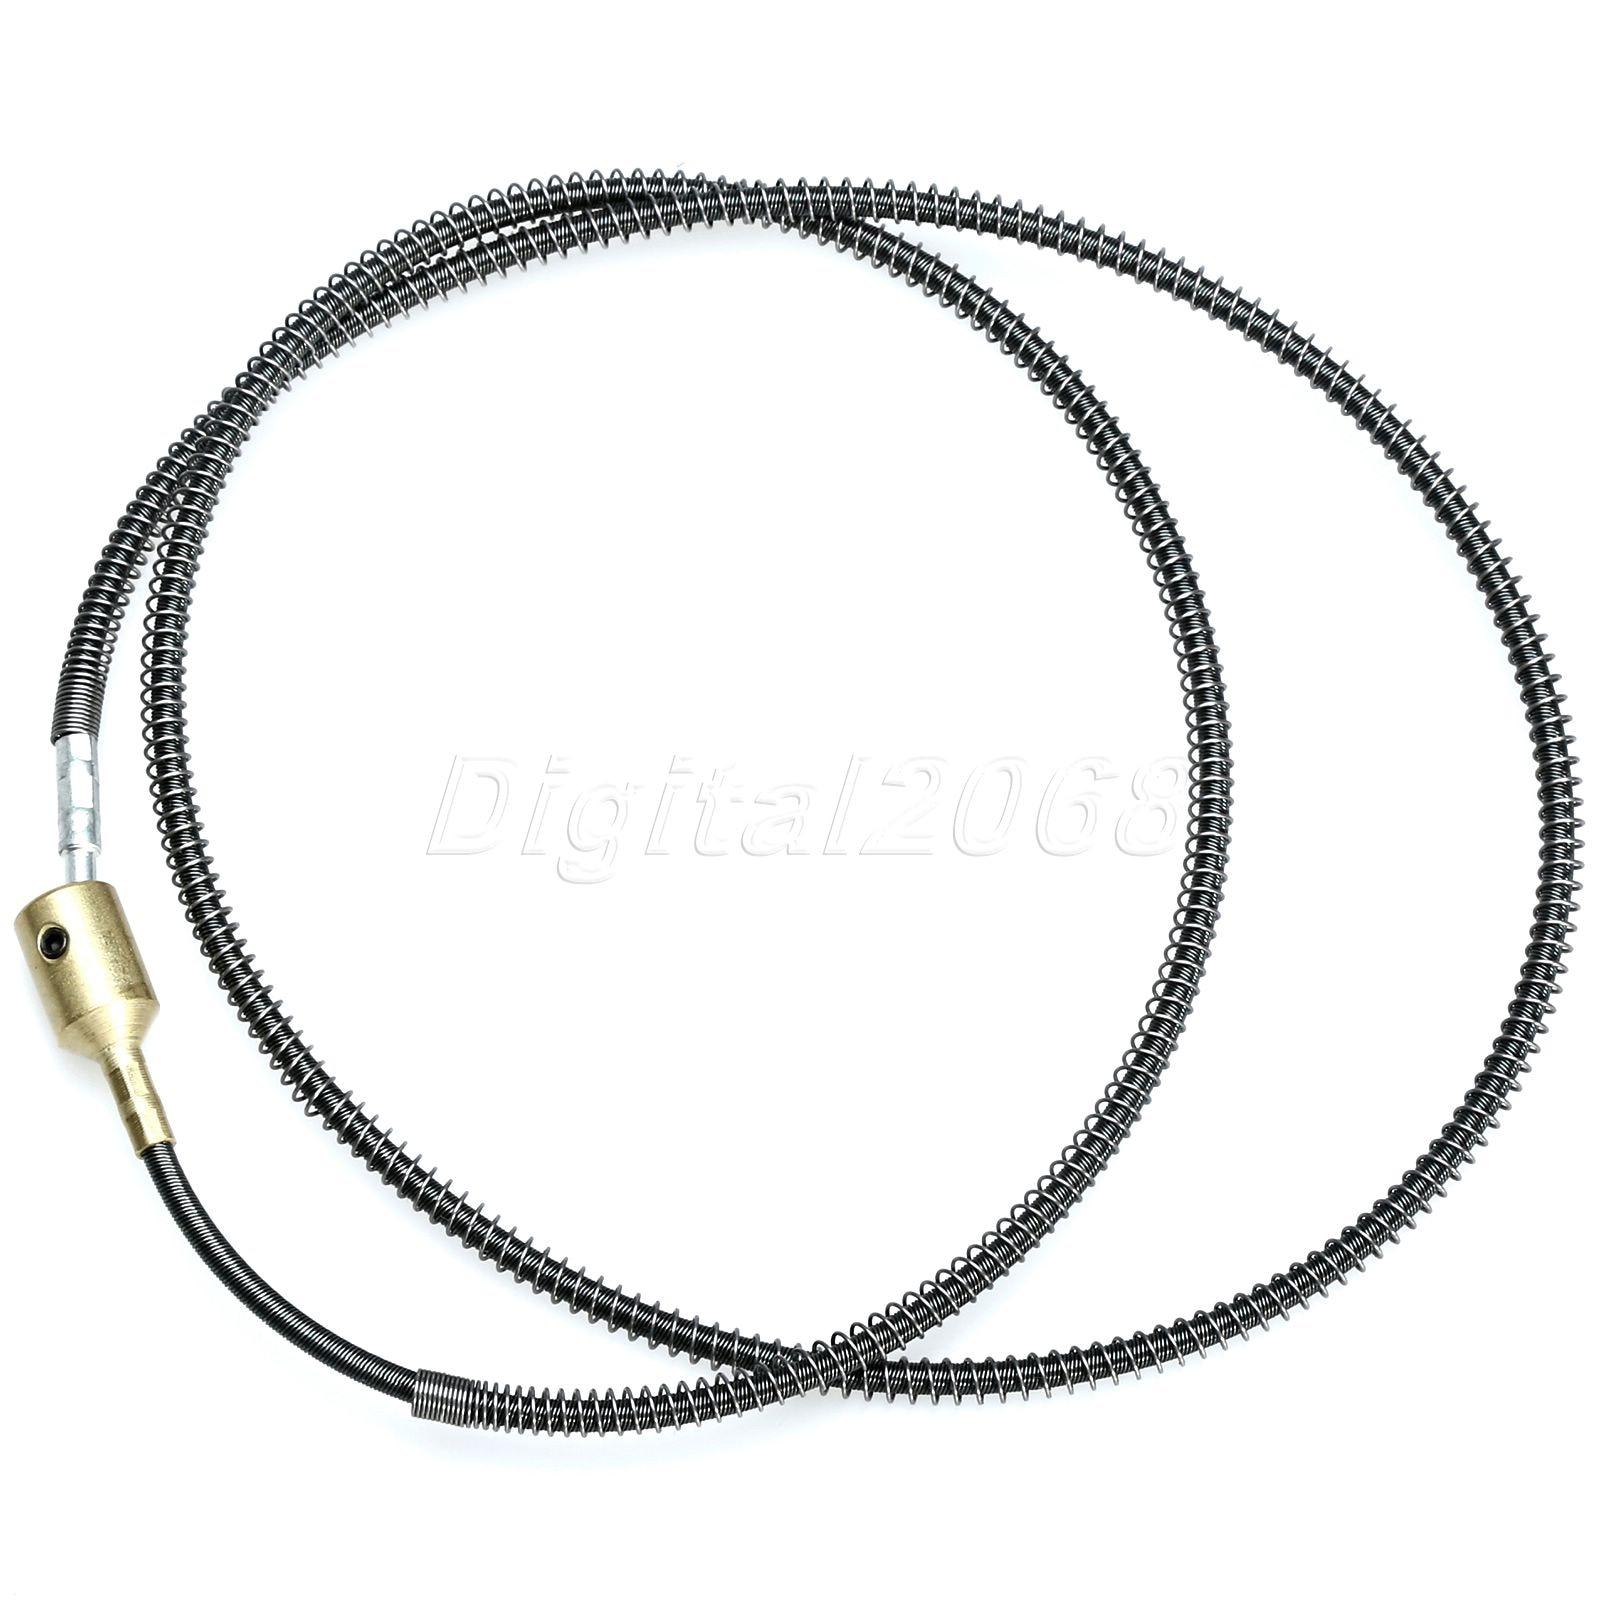 New Flexible Metal Inner Shaft Cable F/Flex Shaft For Foredom Flex Shaft Rotary Motor Tools чехол autoprofi extra comfort black dark grey eco 1105 bk d gy m